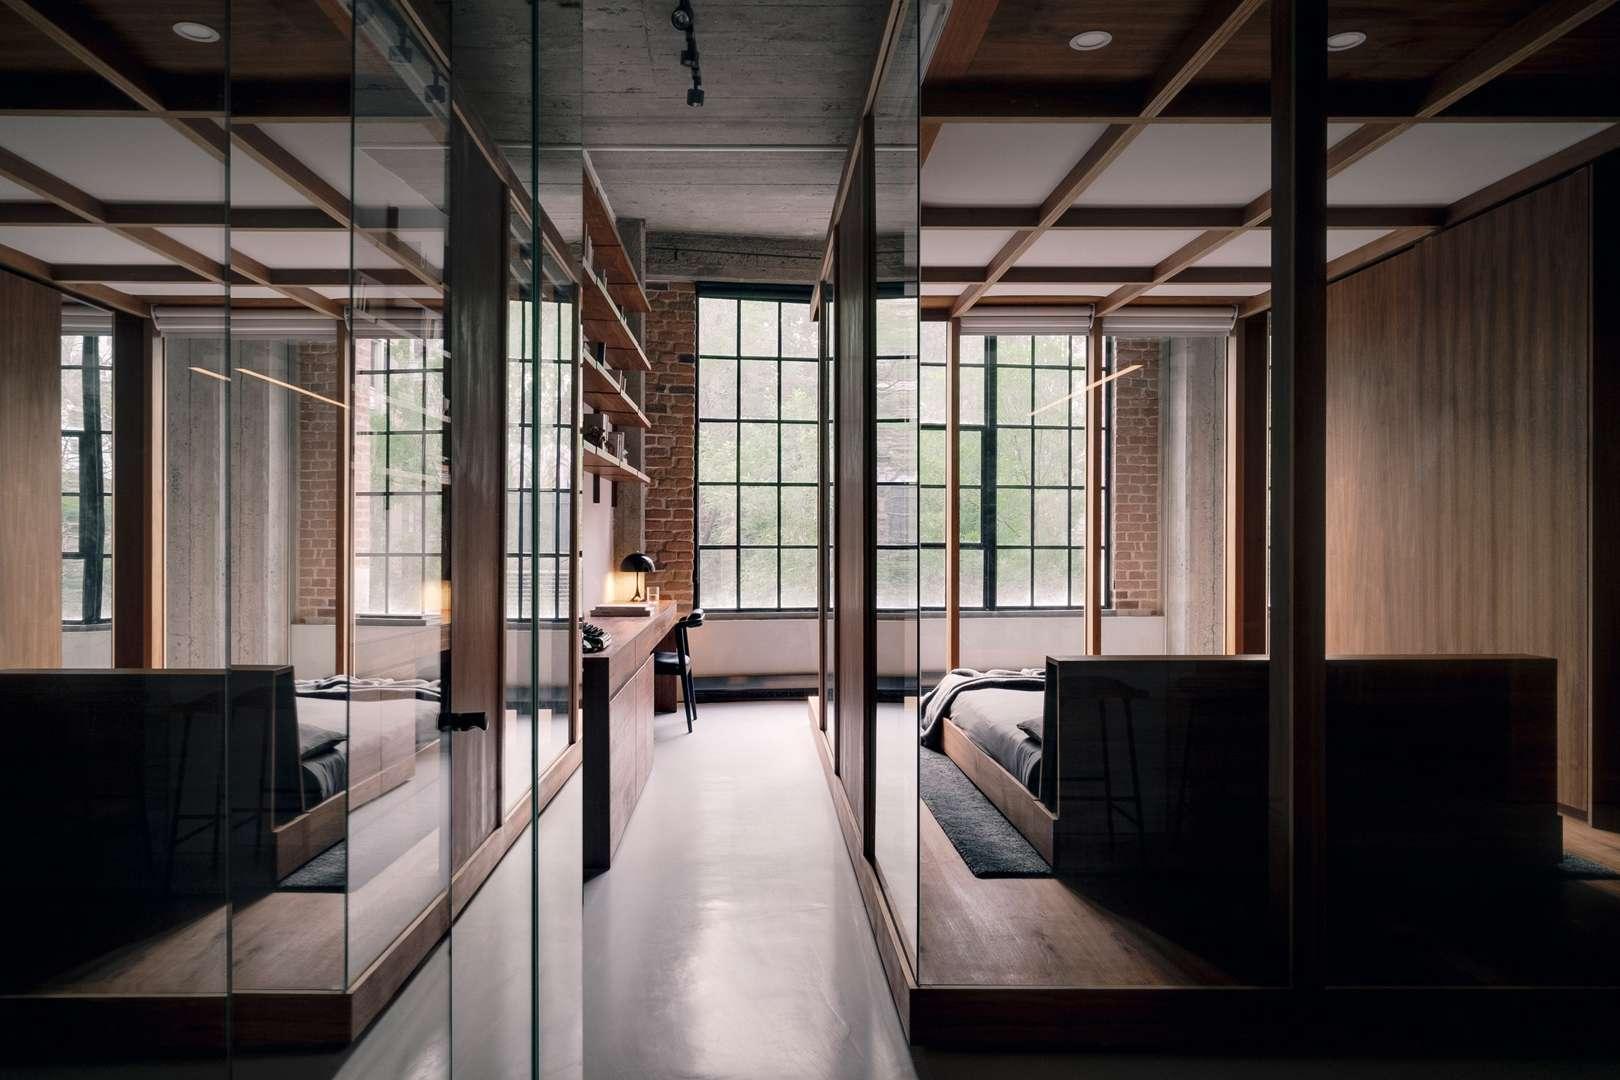 montreal-loft-renovation-by-future-simple-studio-interiors-canada_dezeen_2364_col_7